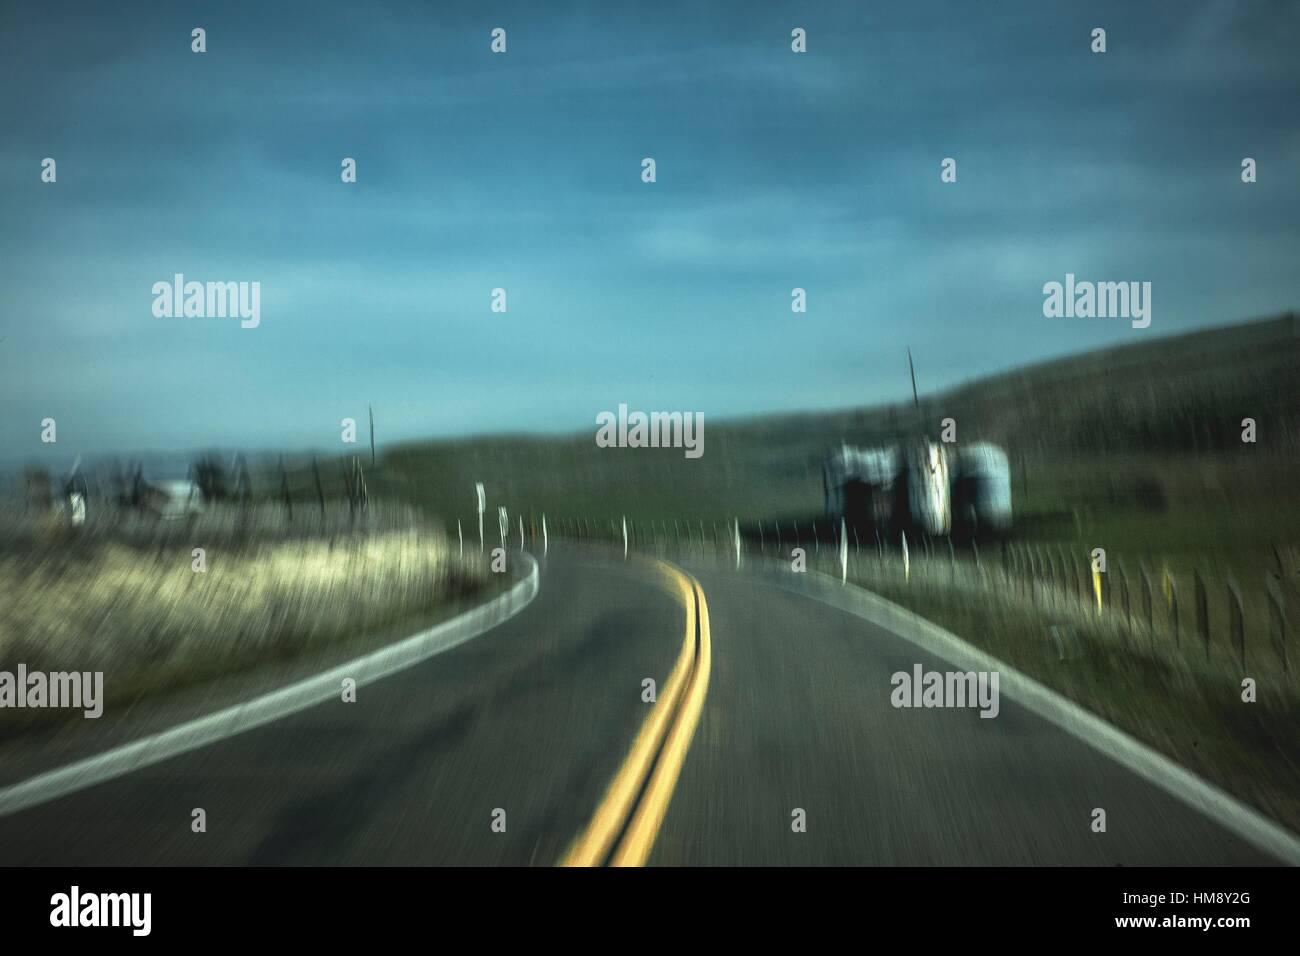 A two lane road passes through pastureland in rural California. - Stock Image